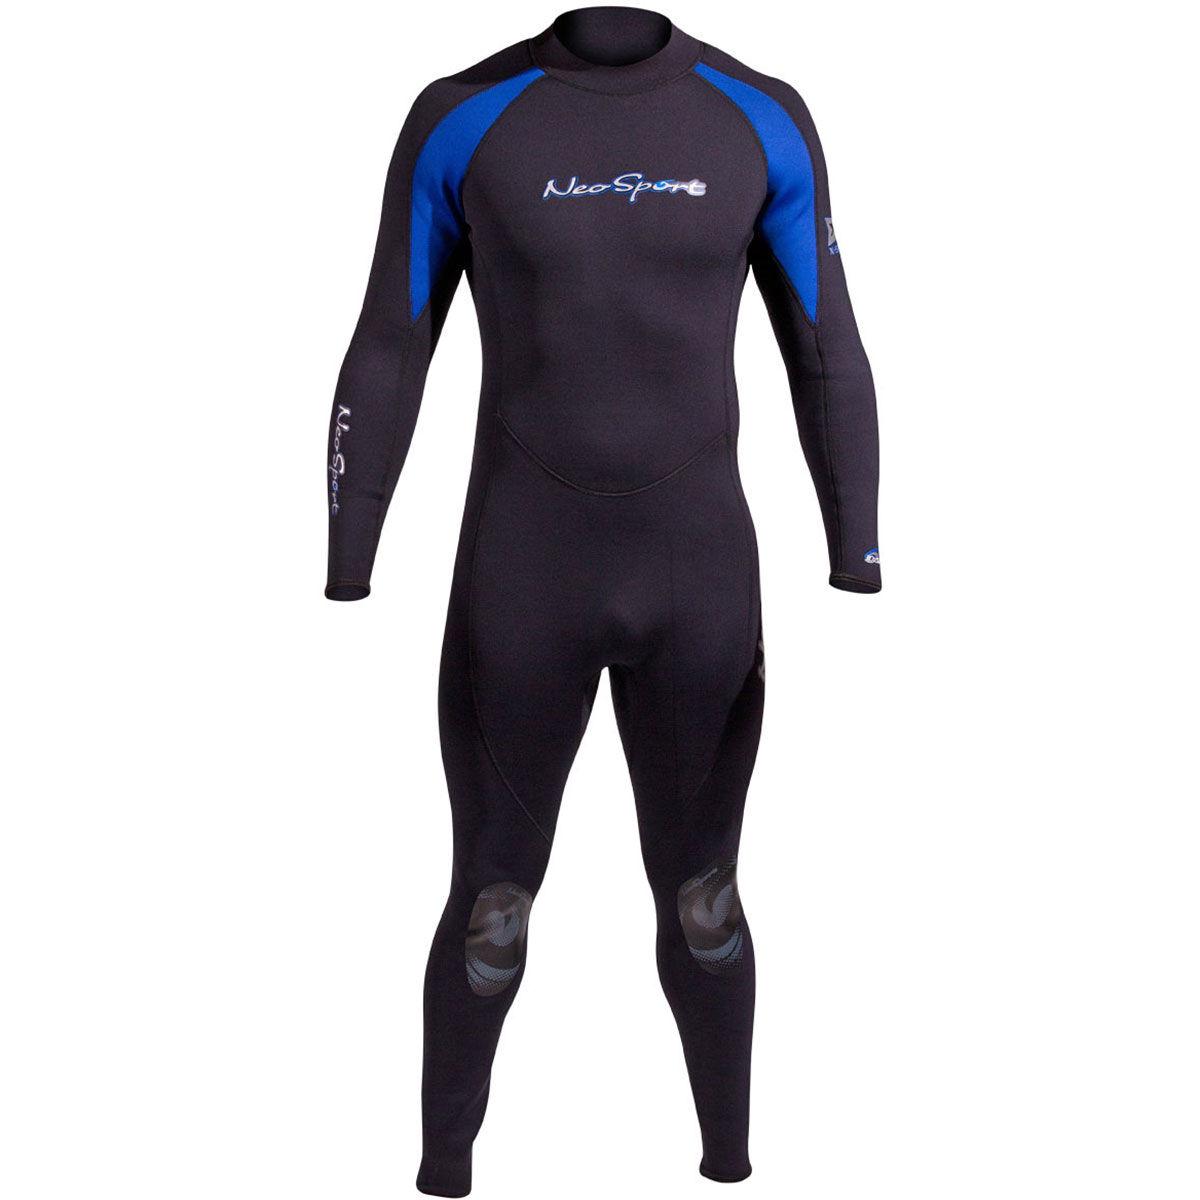 Neosport by Henderson NeoSport XSPAN 5mm Men's Jumpsuit, Black/Blue Small